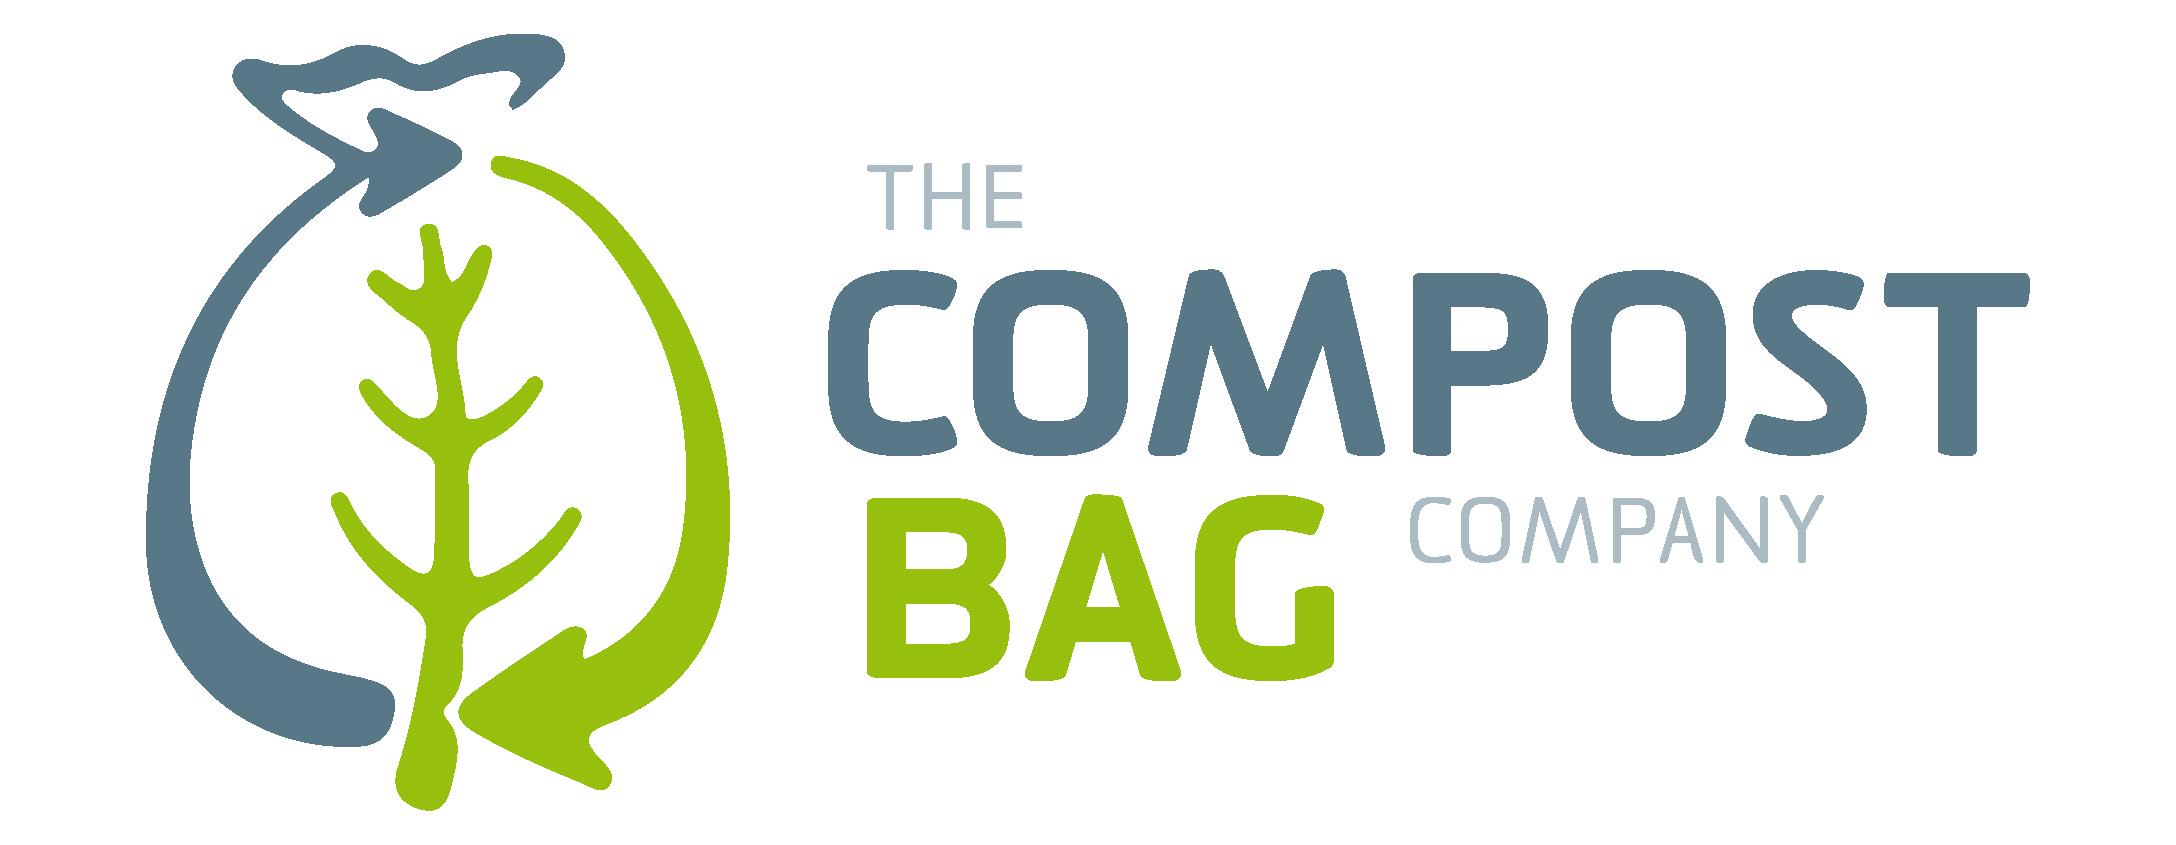 The Compost Bag Company